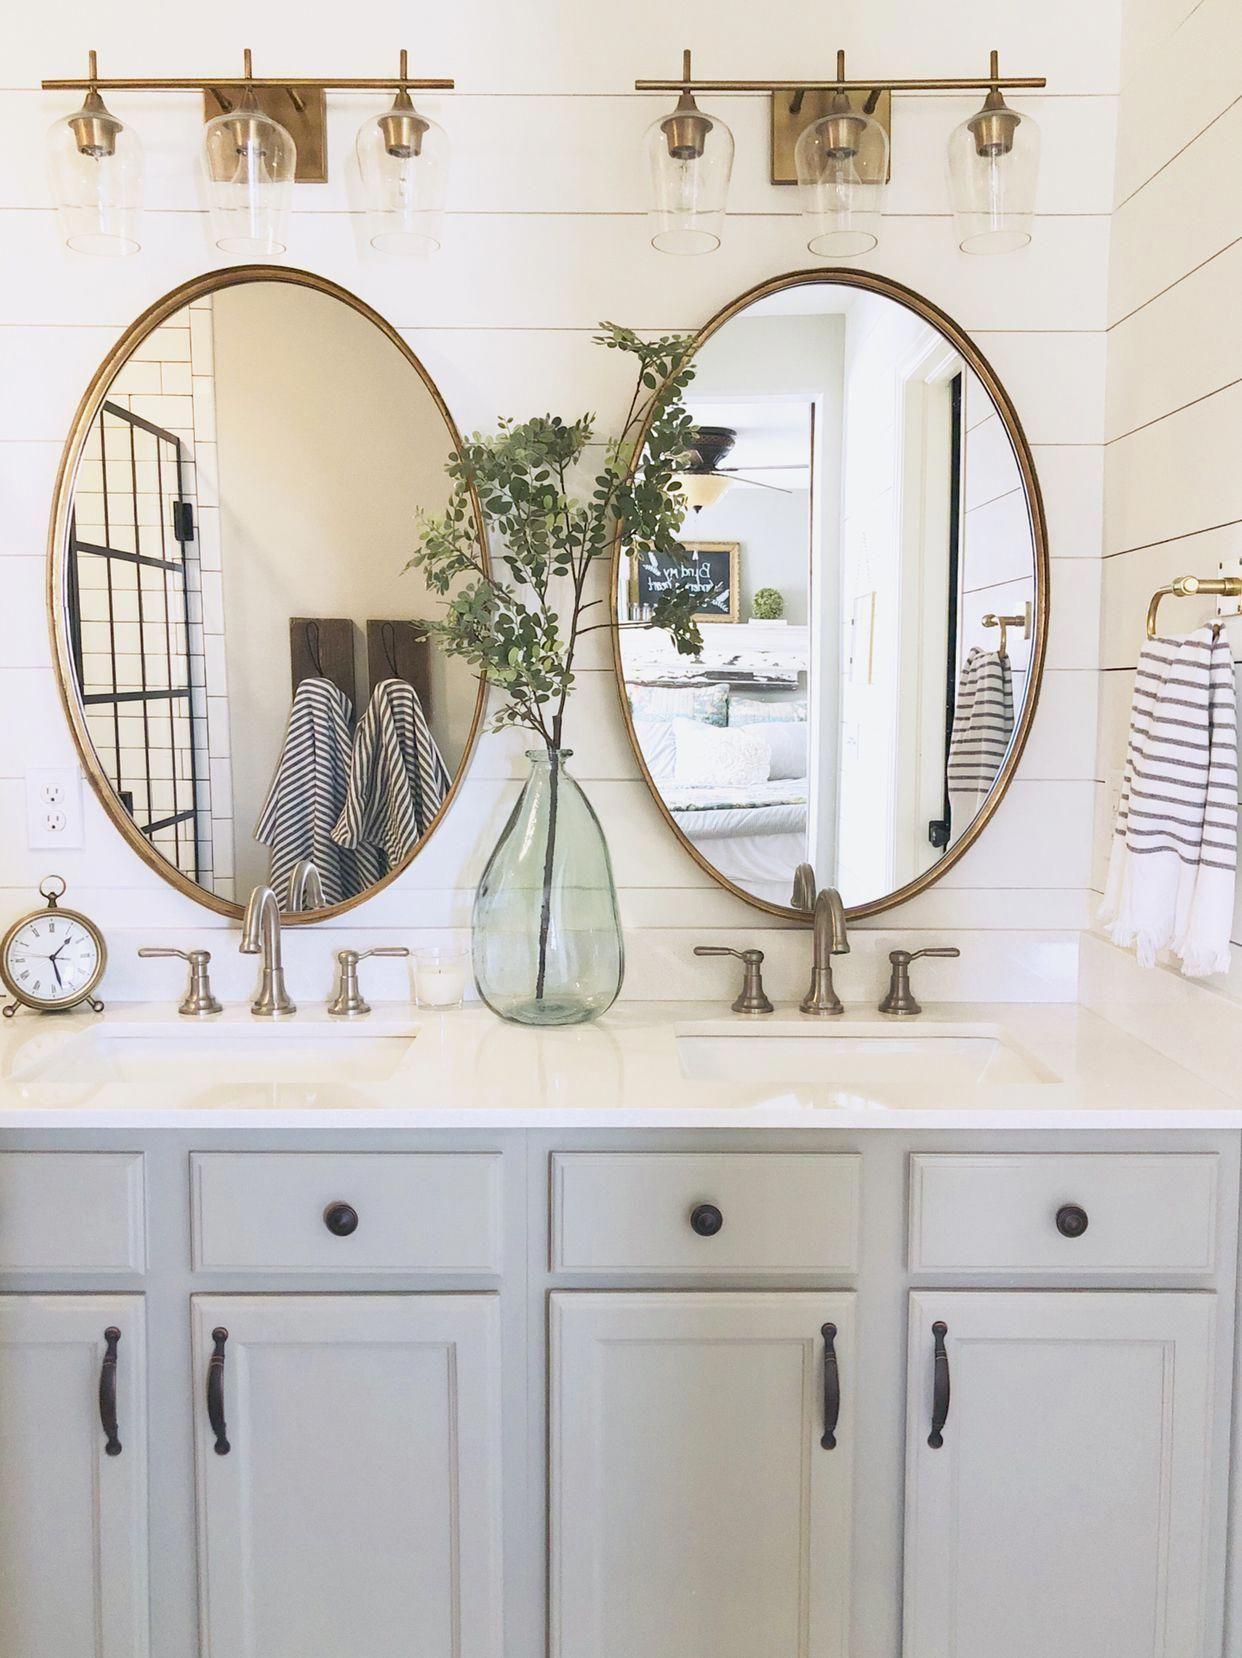 Haus Spiegel Bathroom Inspiration Decor Oval Mirror Bathroom Oval Bathroom Mirror Ideas